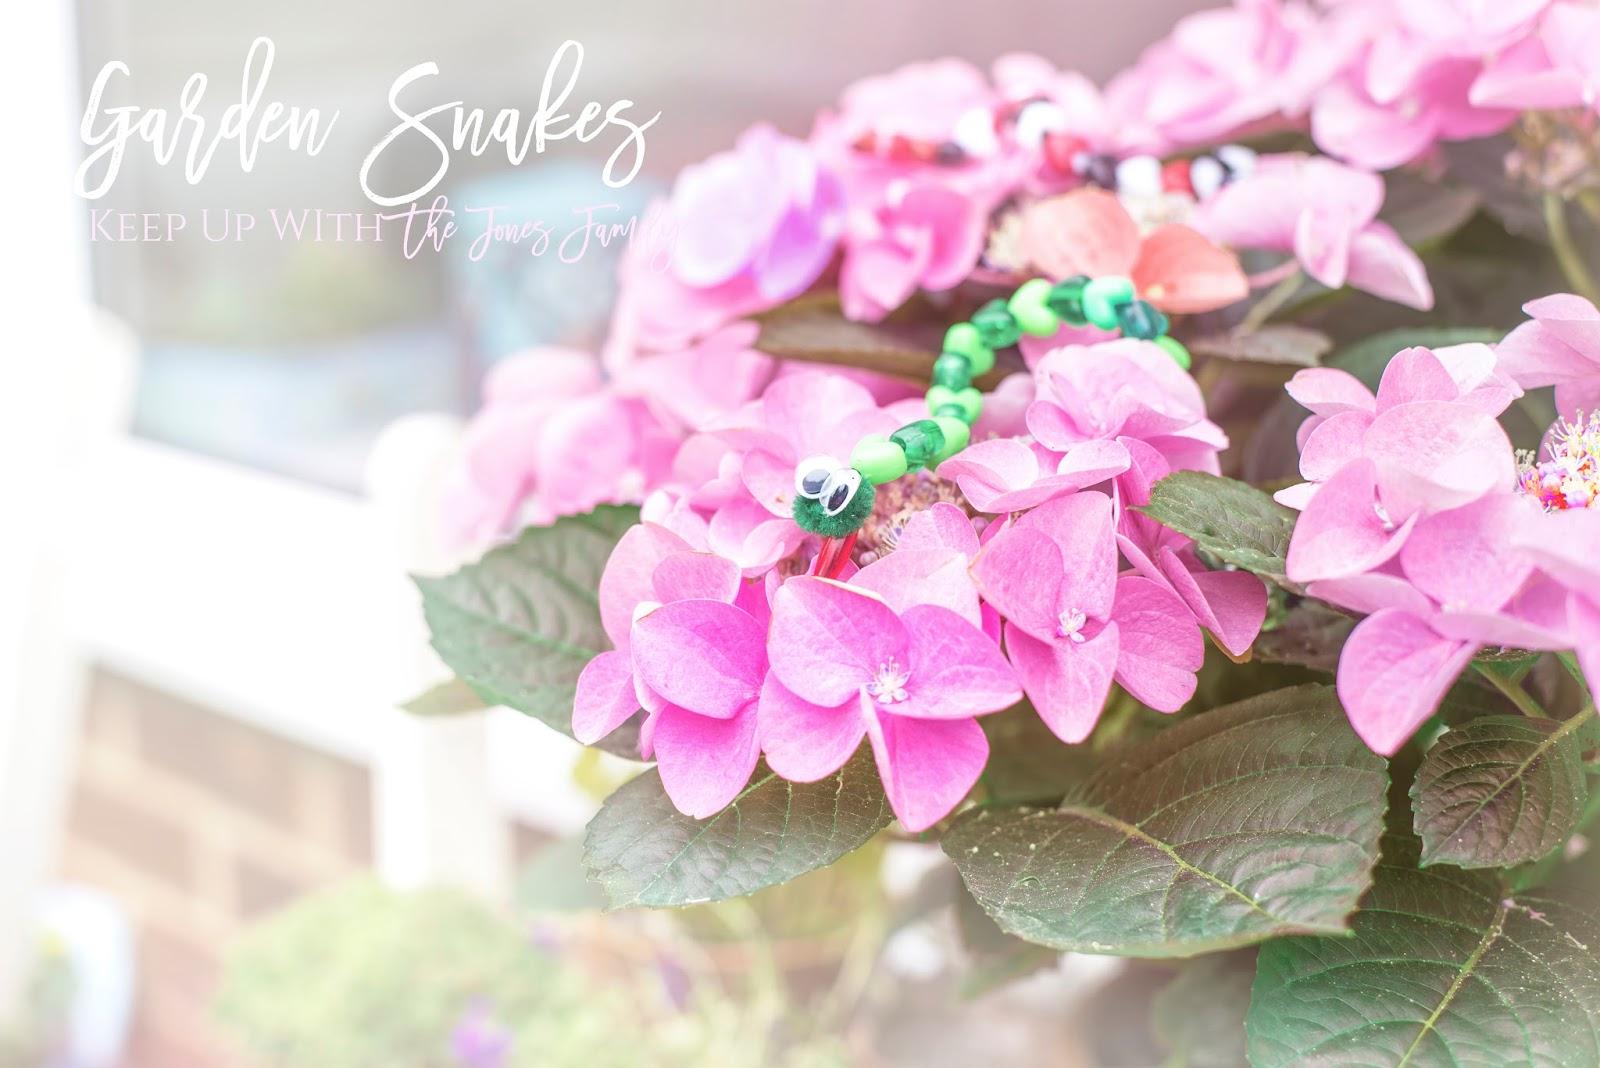 gardensnakestots